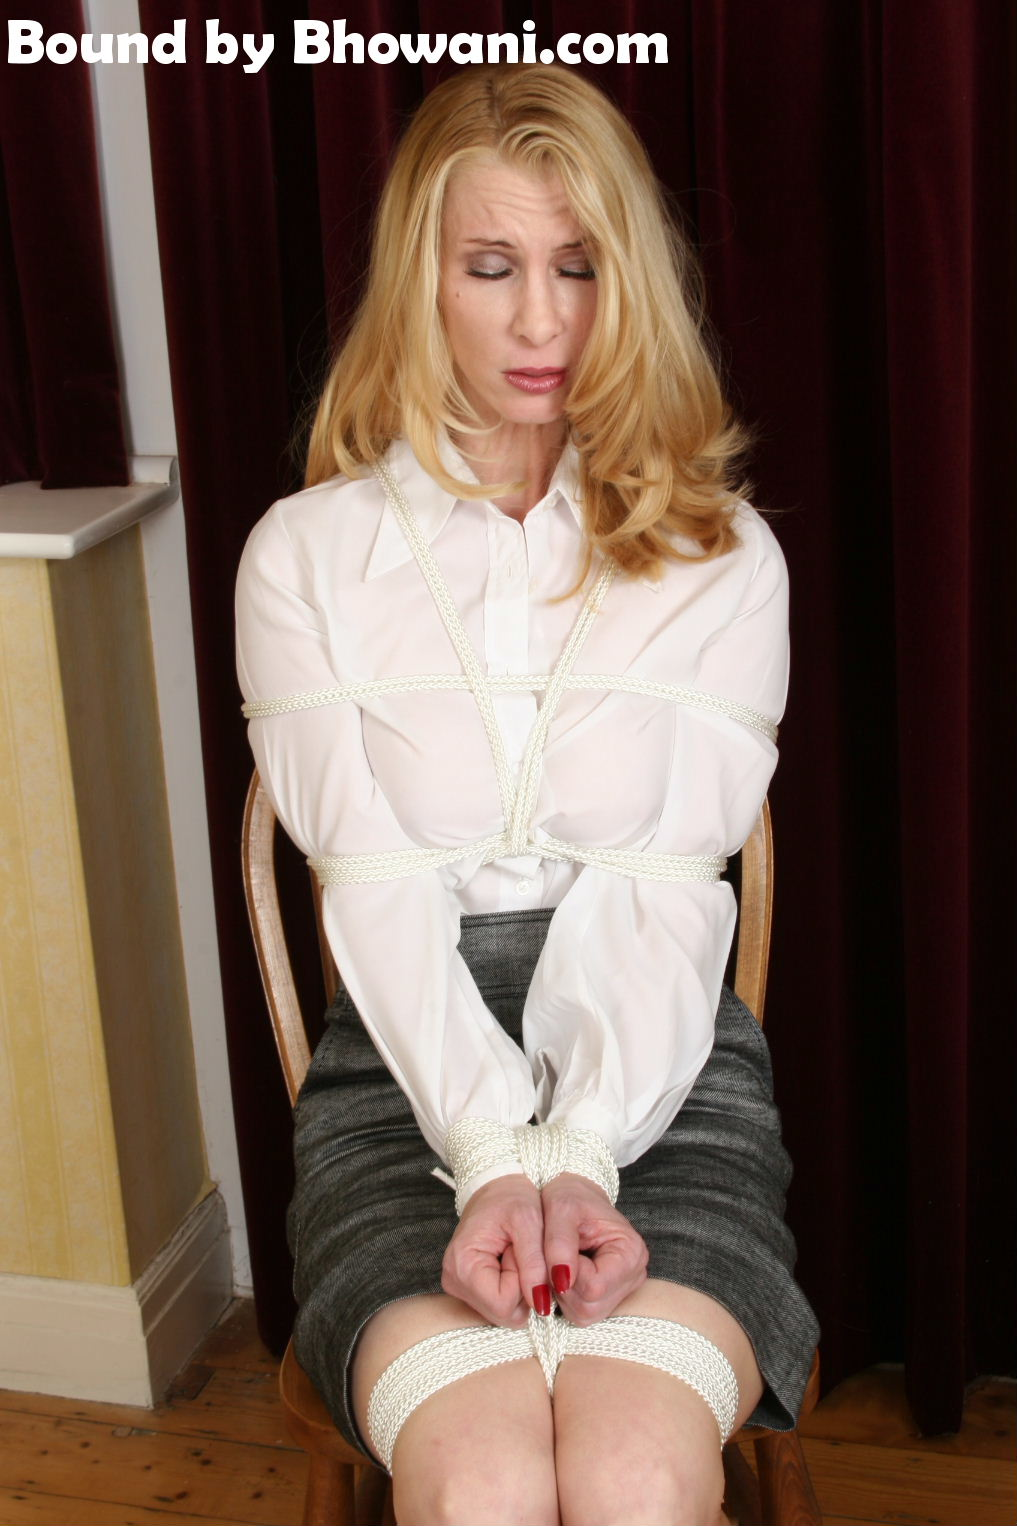 Tied Up Secretary 2